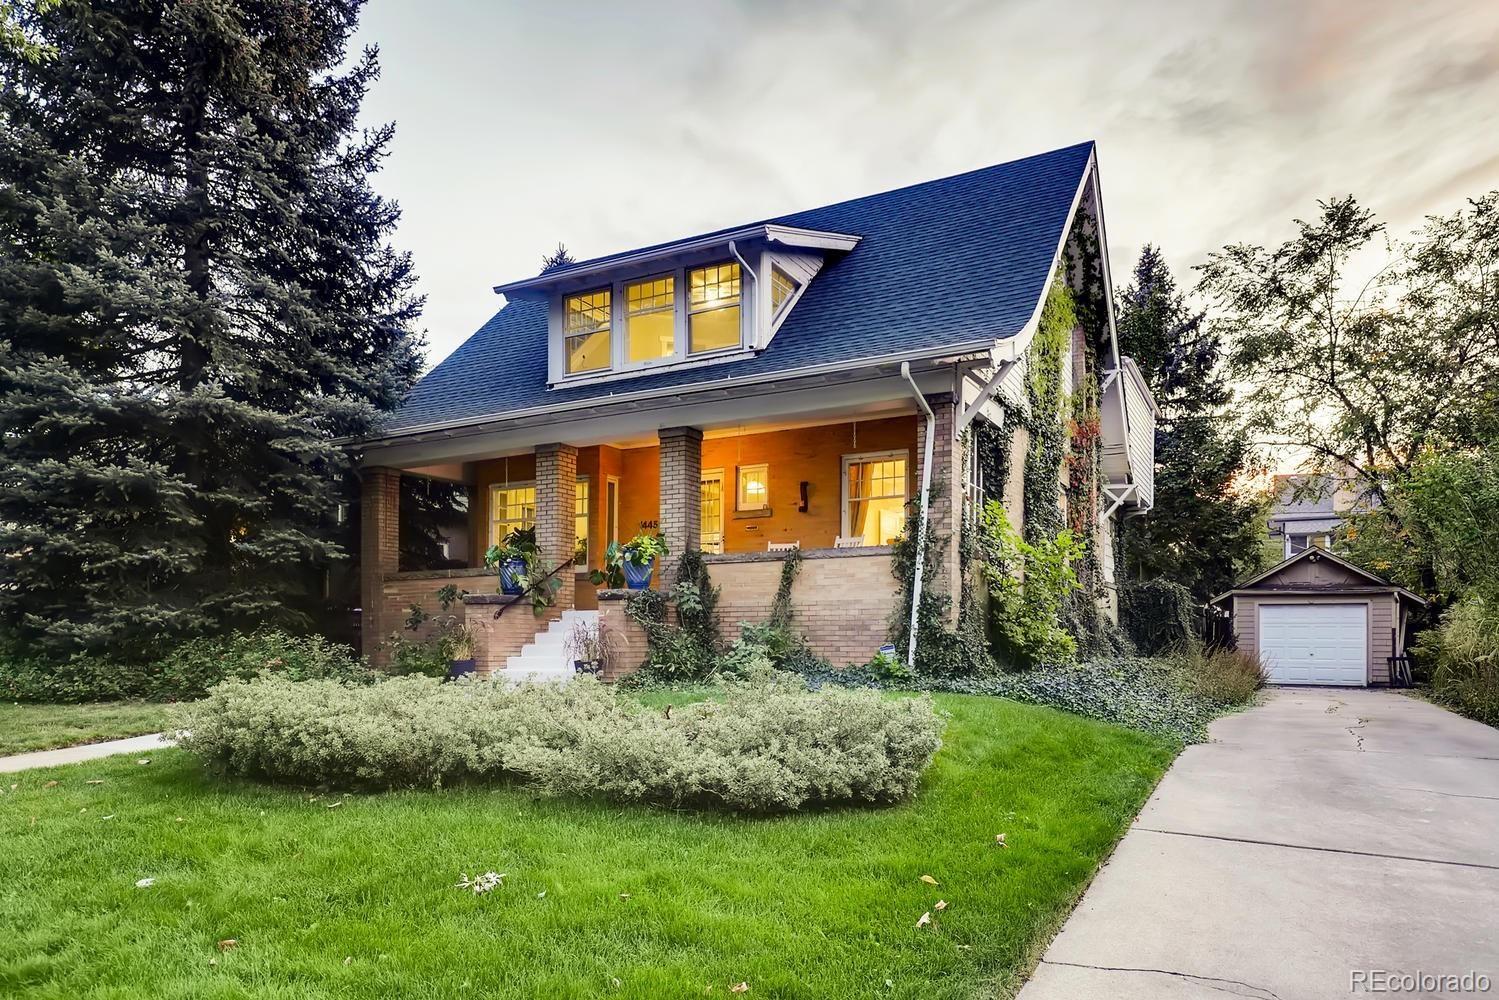 MLS# 6957712 - 1 - 1445  Bellaire Street, Denver, CO 80220